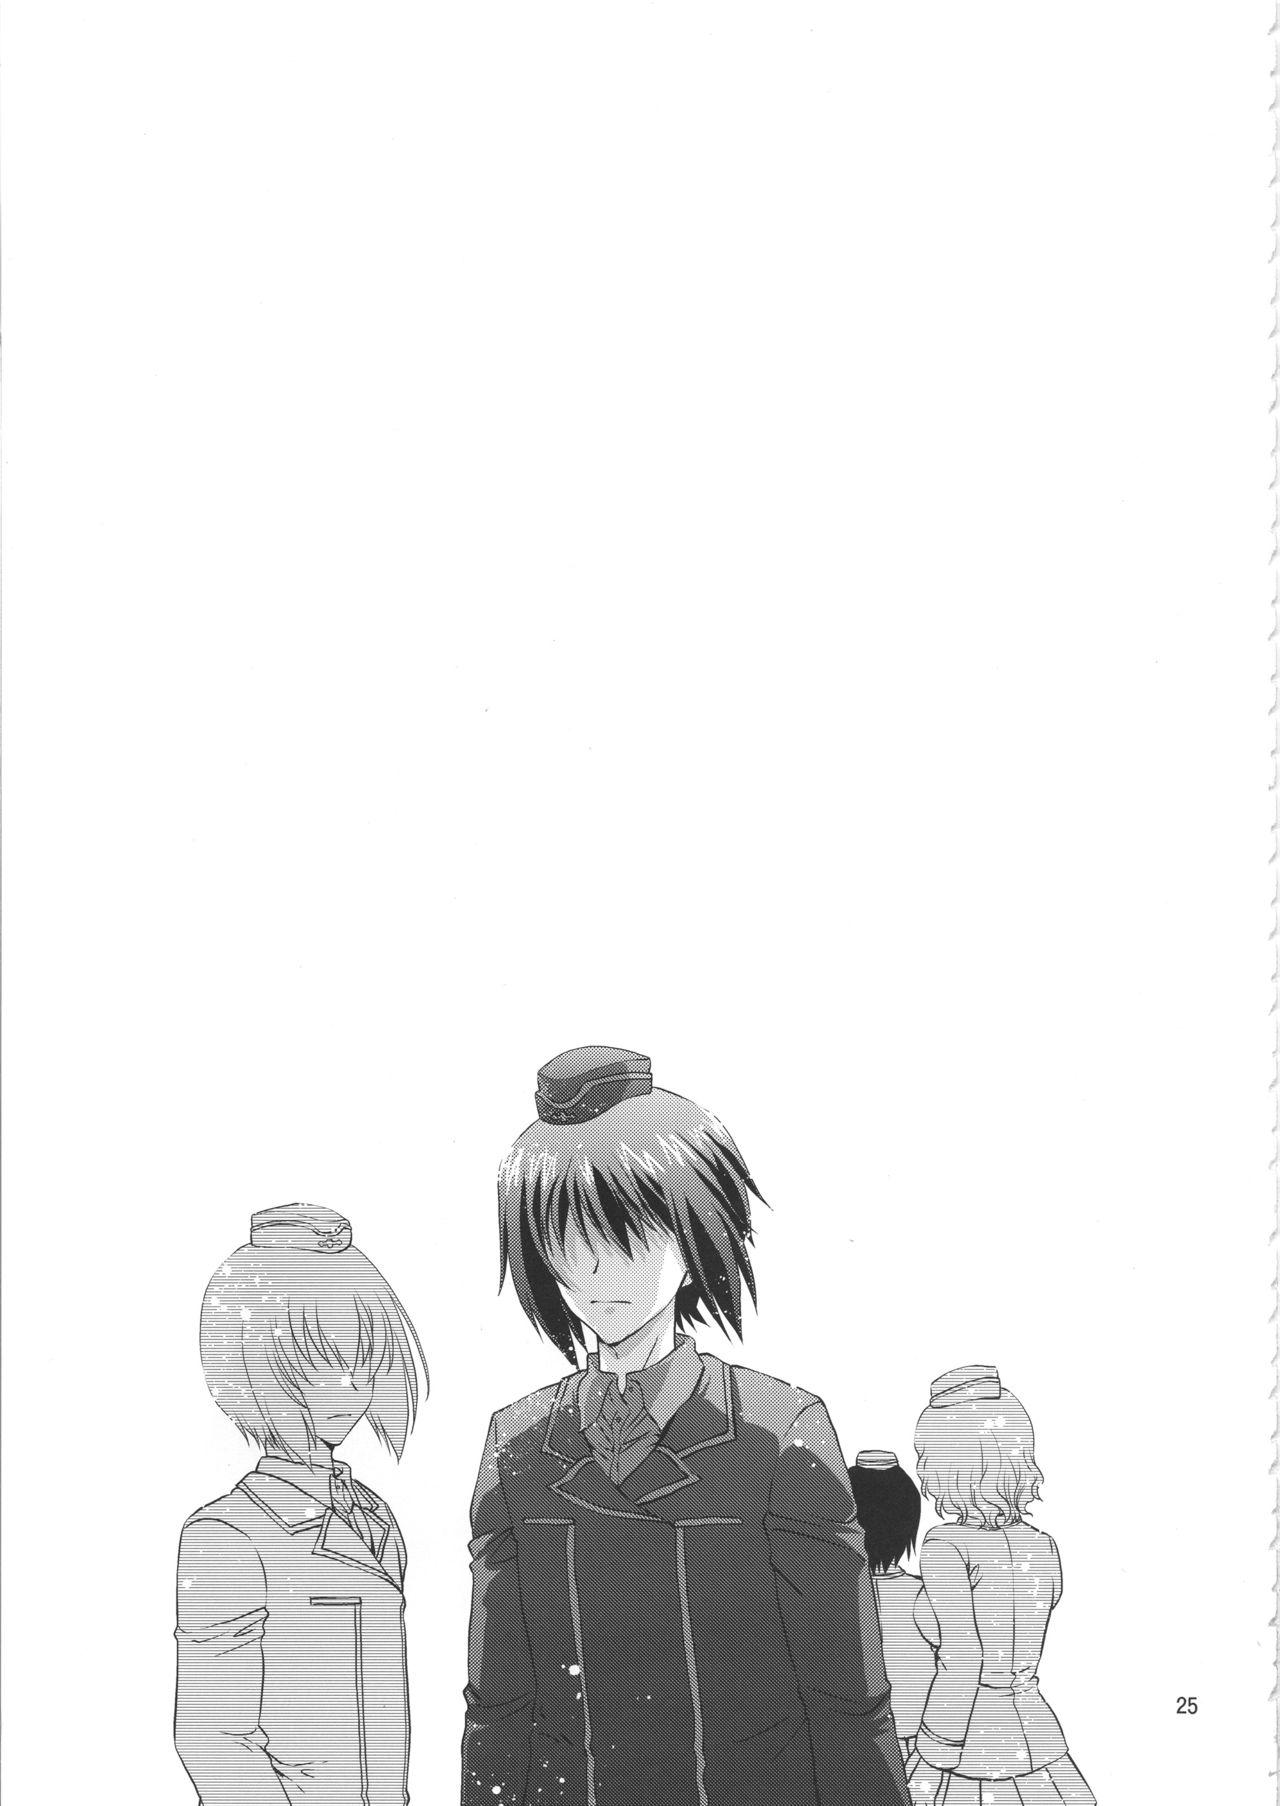 Onii-chan to Issho desu! 23